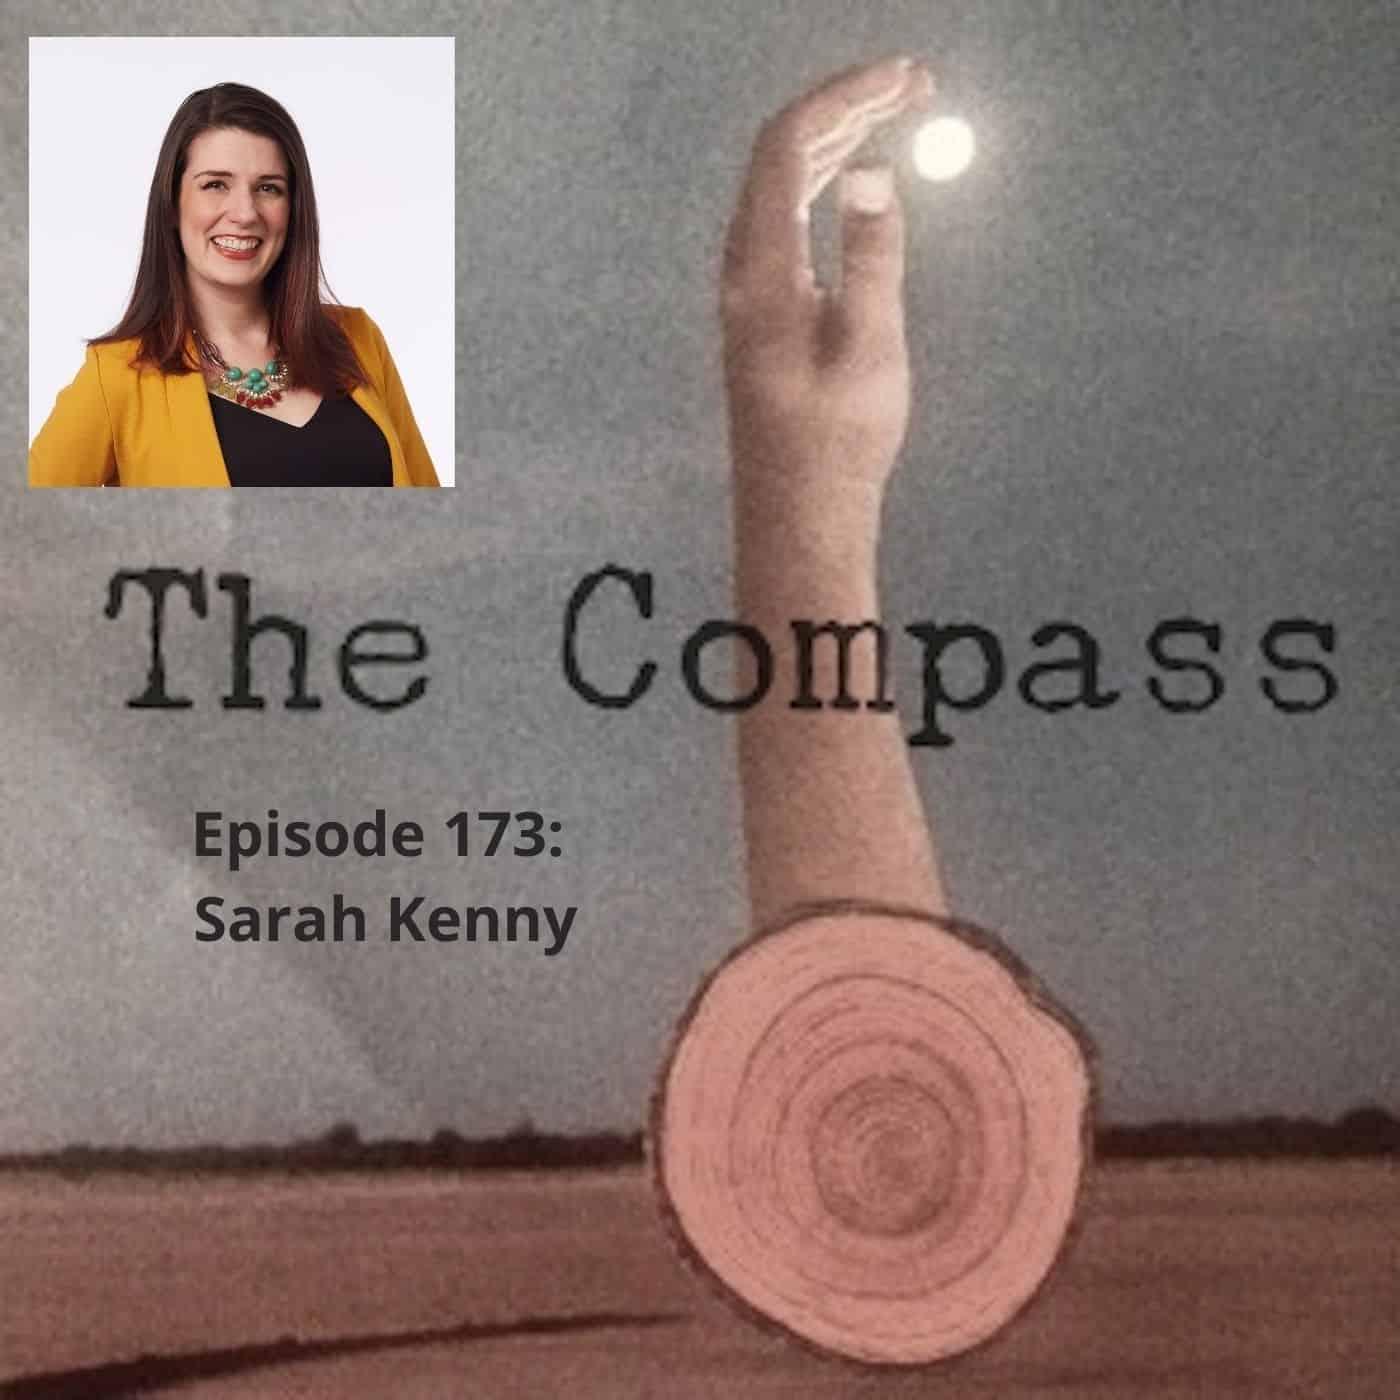 Episode 173: Sarah Kenny